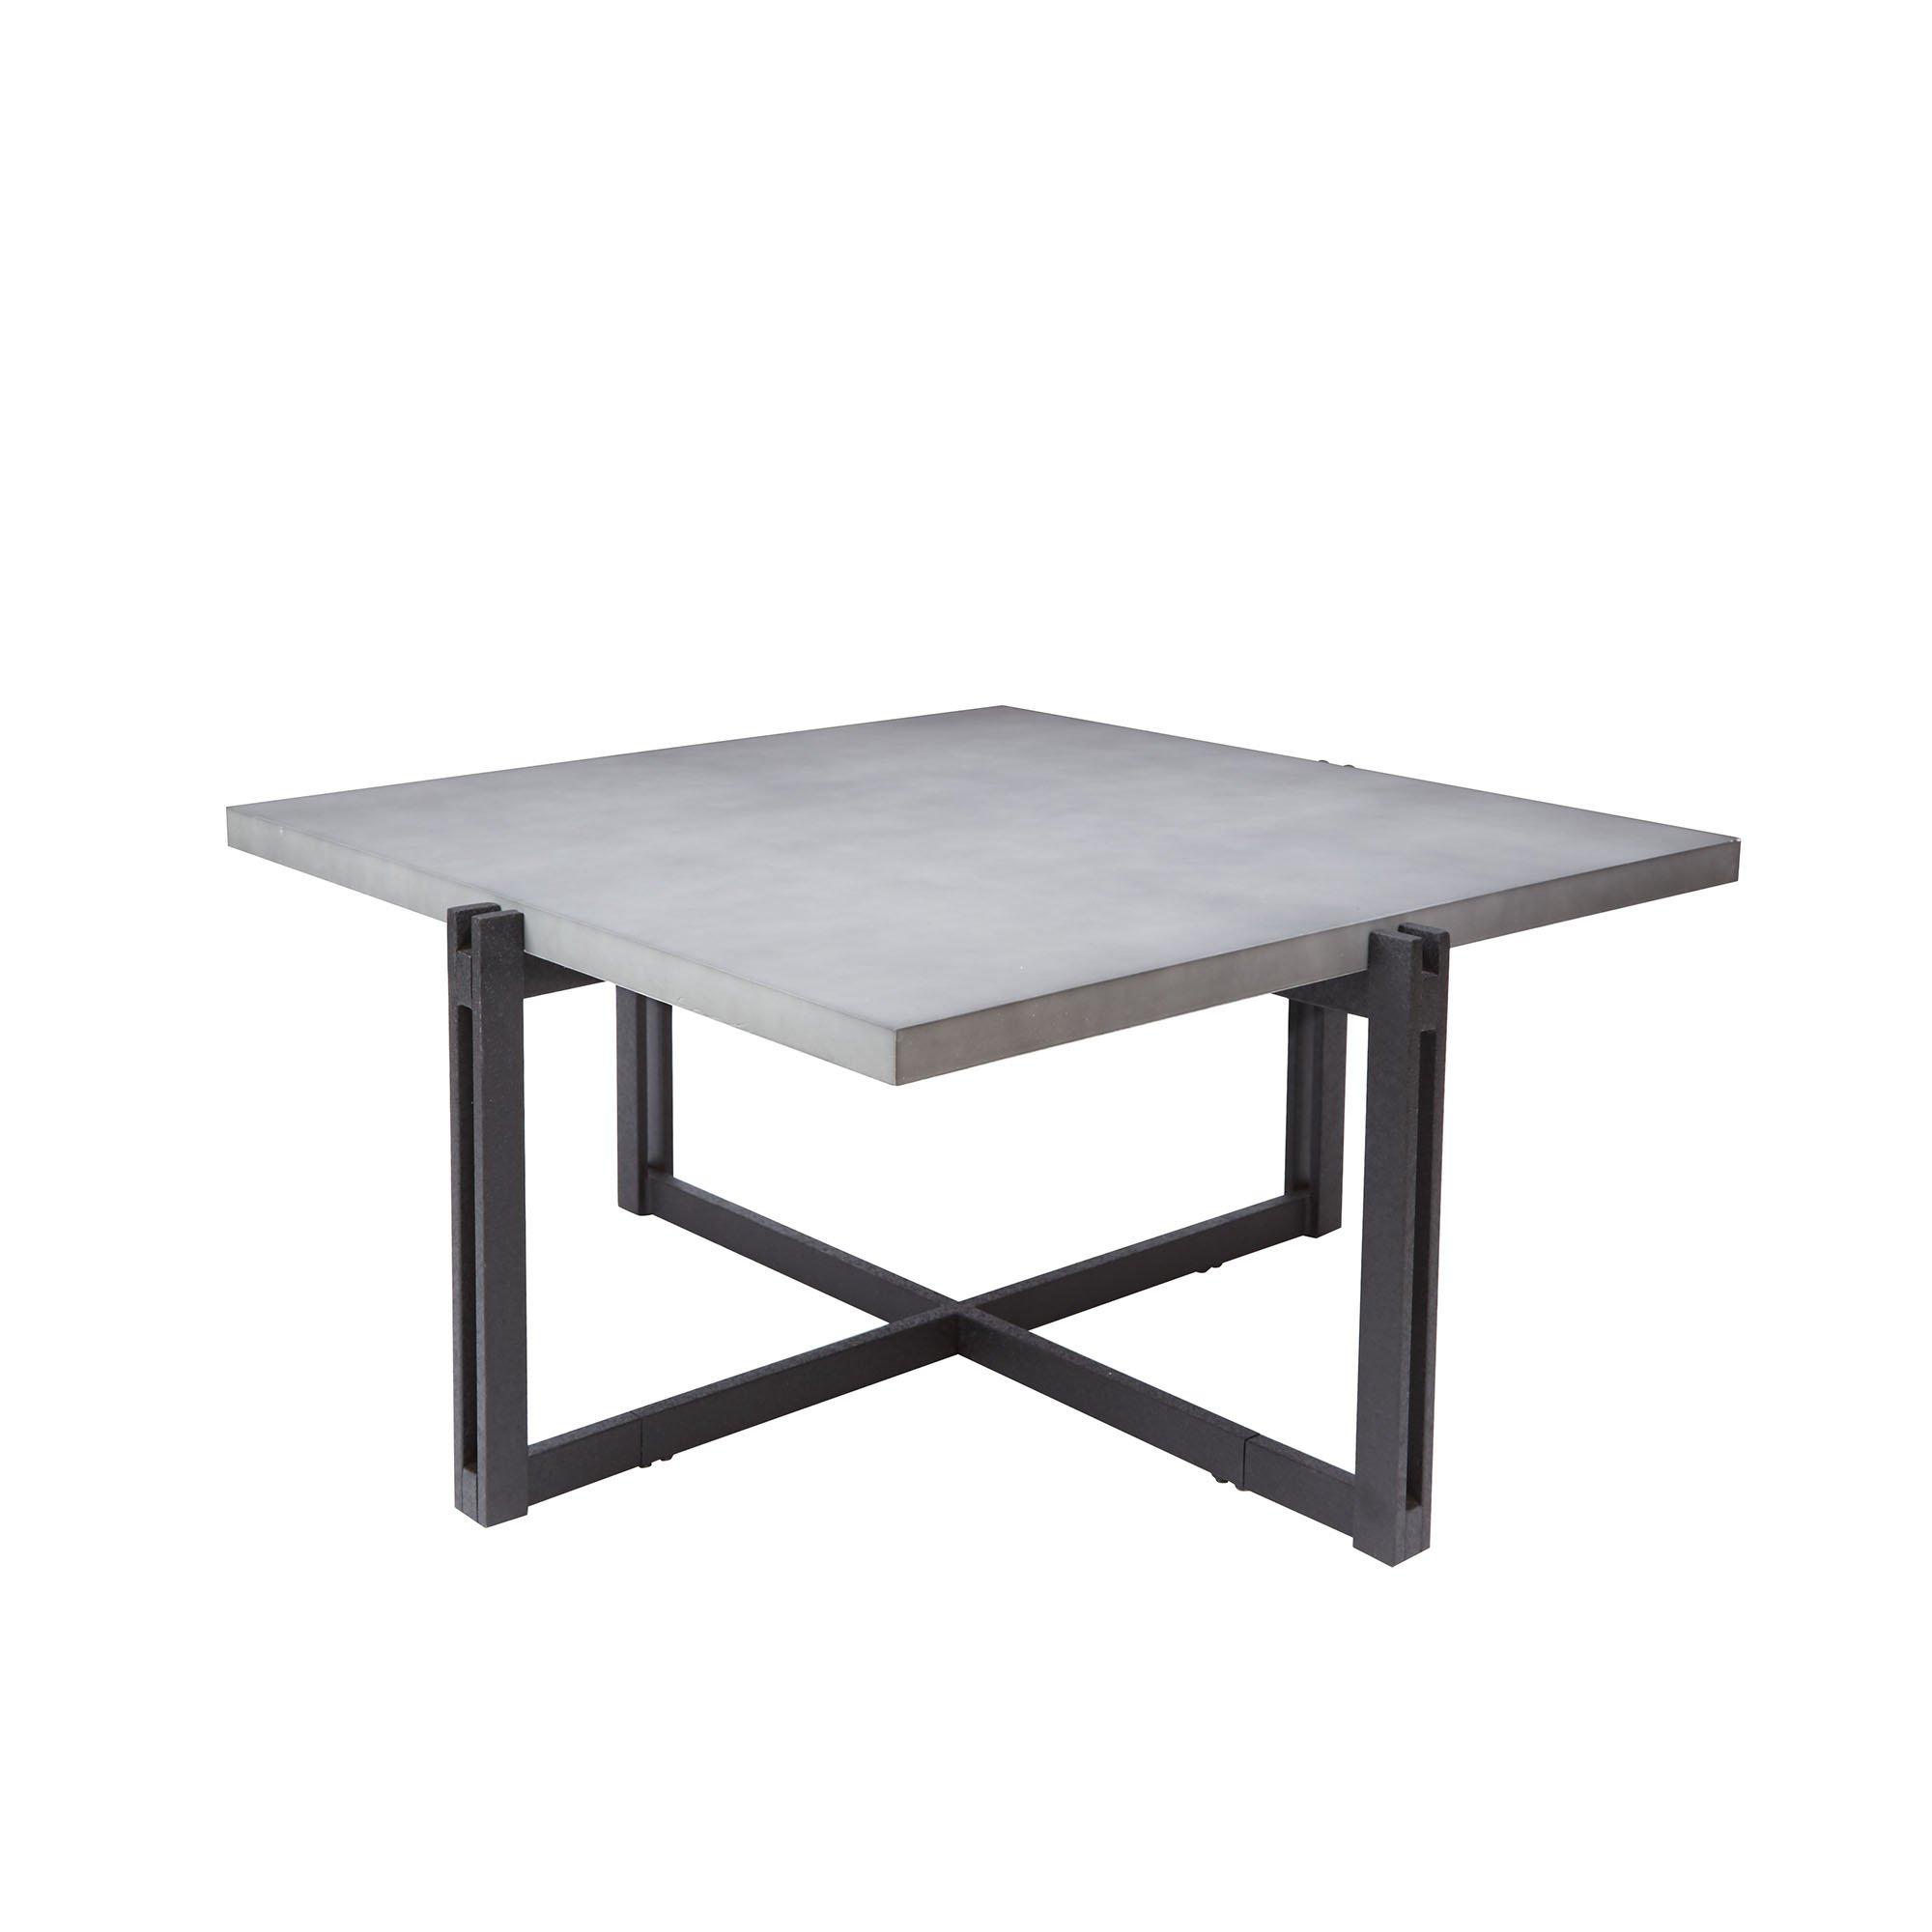 "Silverwood FT1275-COF-SCC Dakota Coffee Table with Square Concrete Finish Top, 39"" L x 39"" W x 19.25"" H, Concrete Grey"